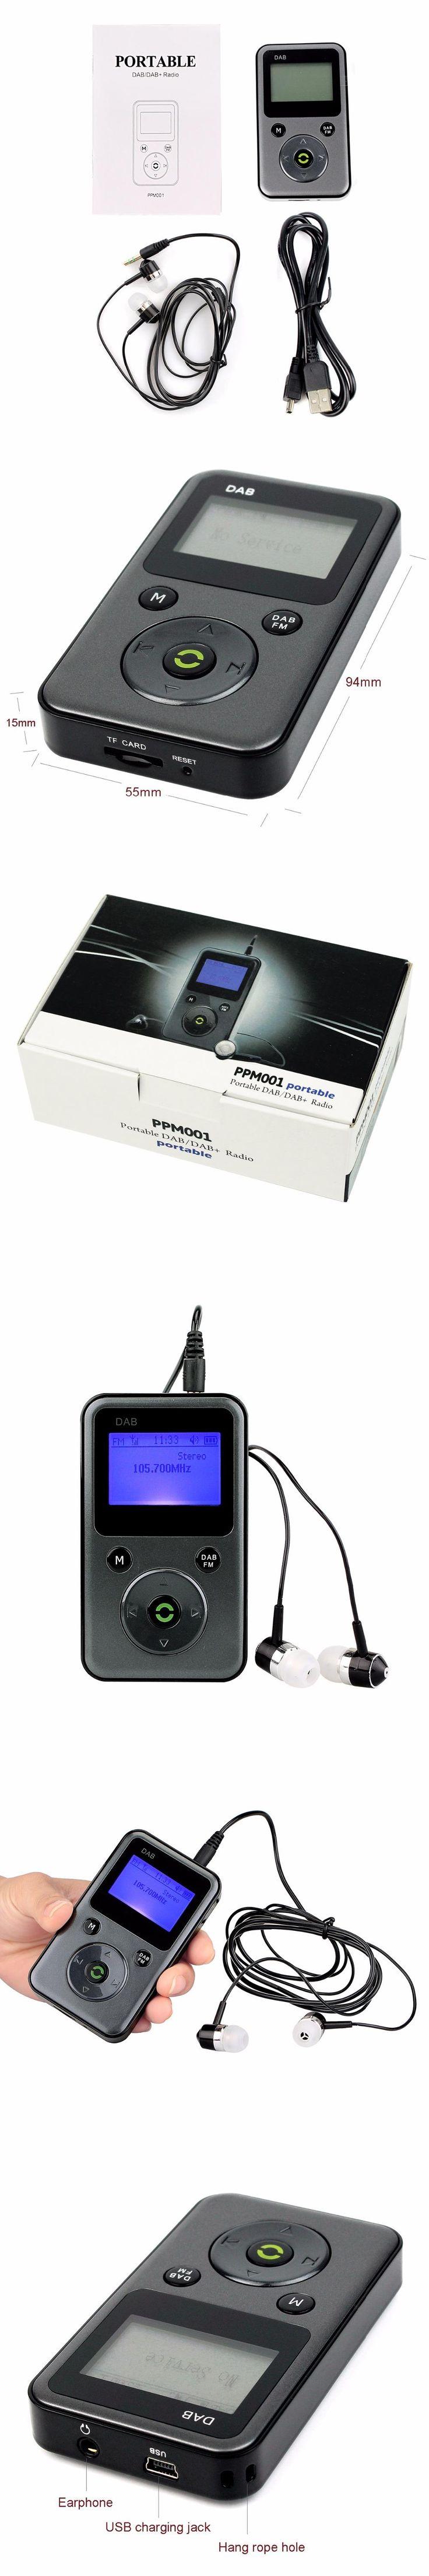 Portable Digital DAB/DAB Radio FM Radio Stereo Receiver REC Recorder Lossless Music Player Automatic Search Local DAB Y4107H